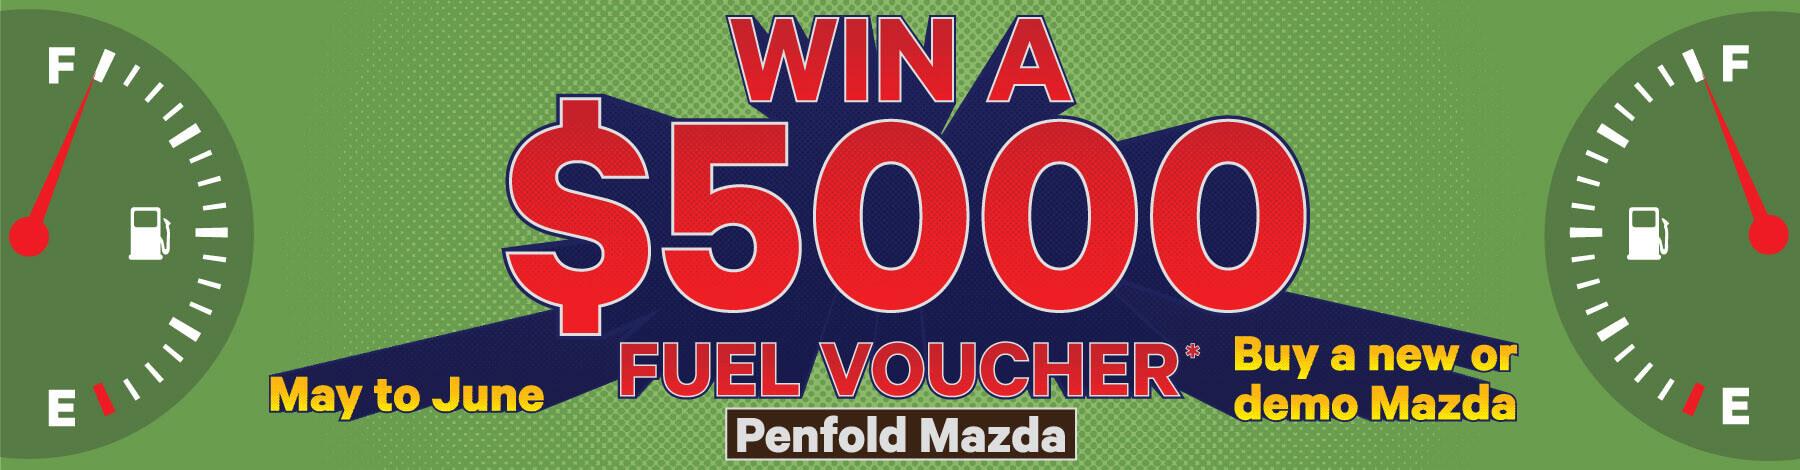 Win a $5000 Fuel Voucher